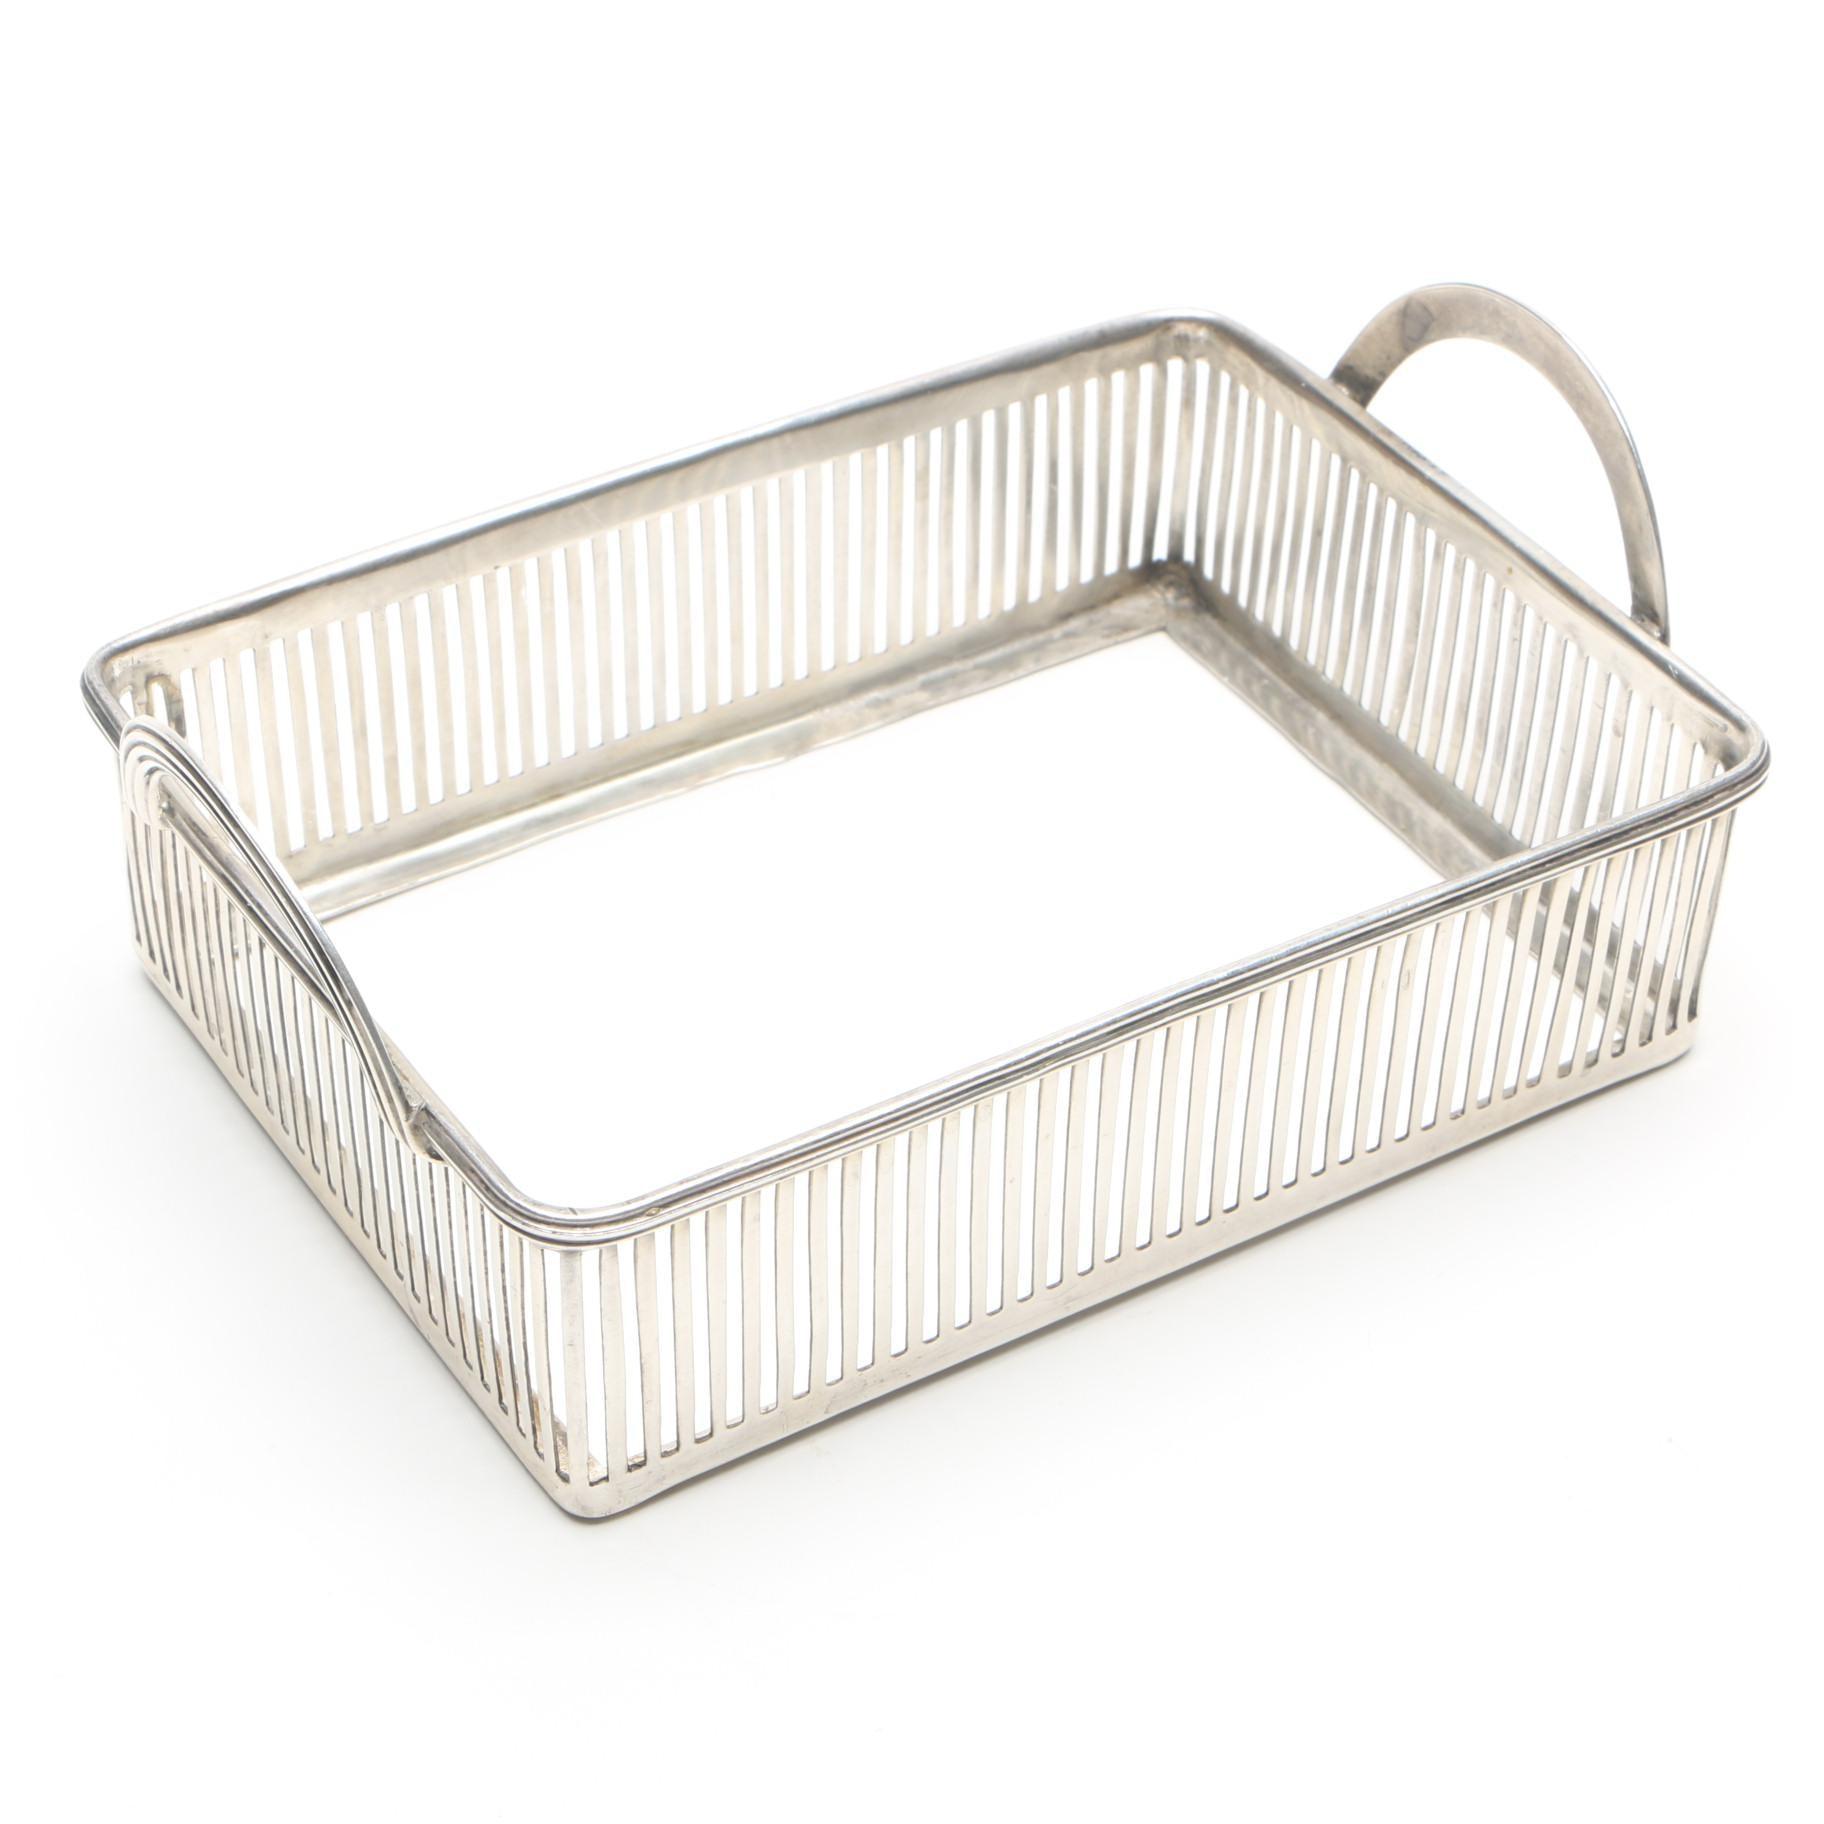 Watson Co. Sterling Silver Tray Frame